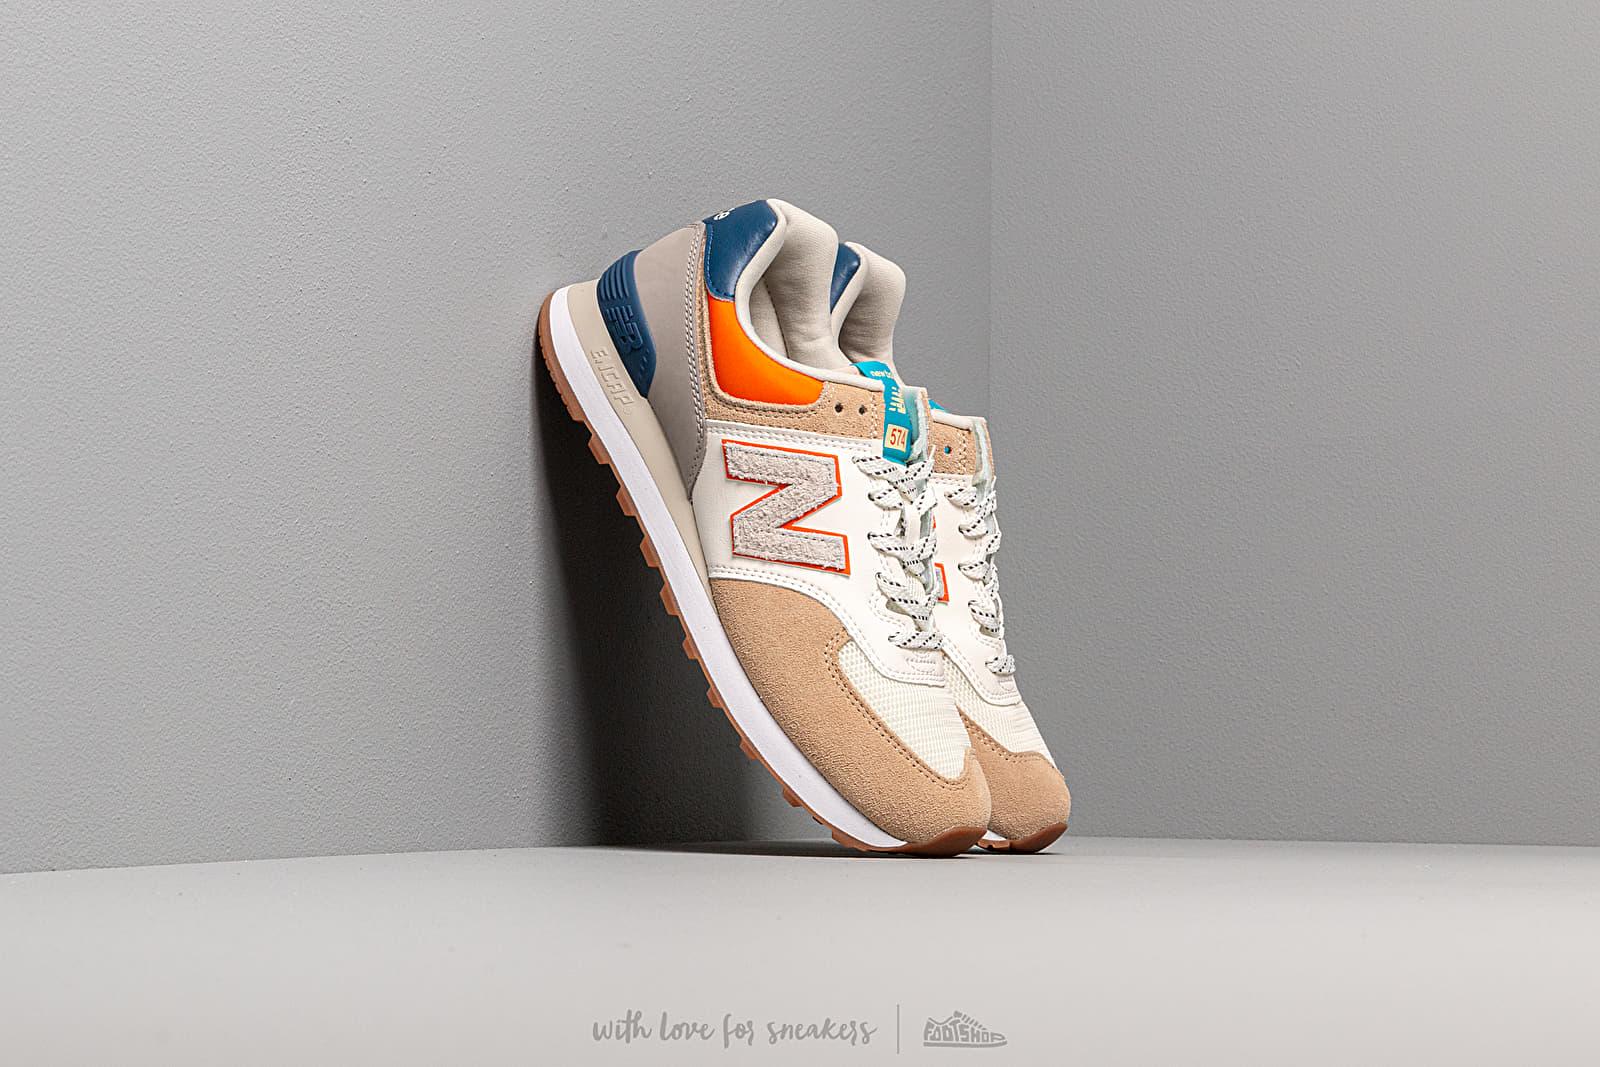 New Balance 574 Beige/ Blue/ Orange za skvelú cenu 92 € kúpite na Footshop.sk